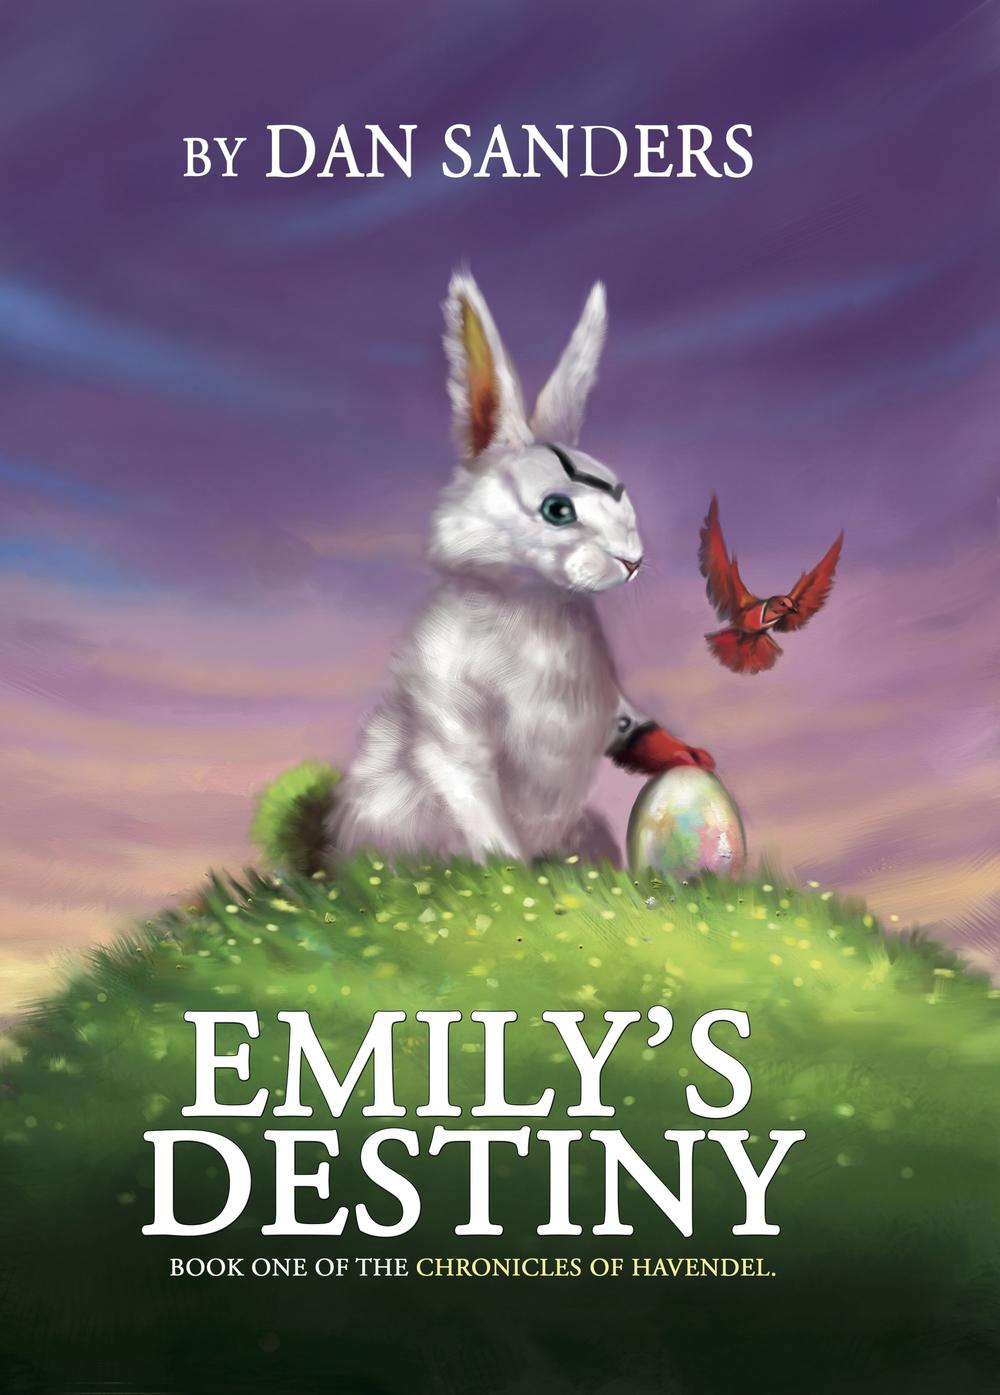 Emily's Destiny by Dan Sanders